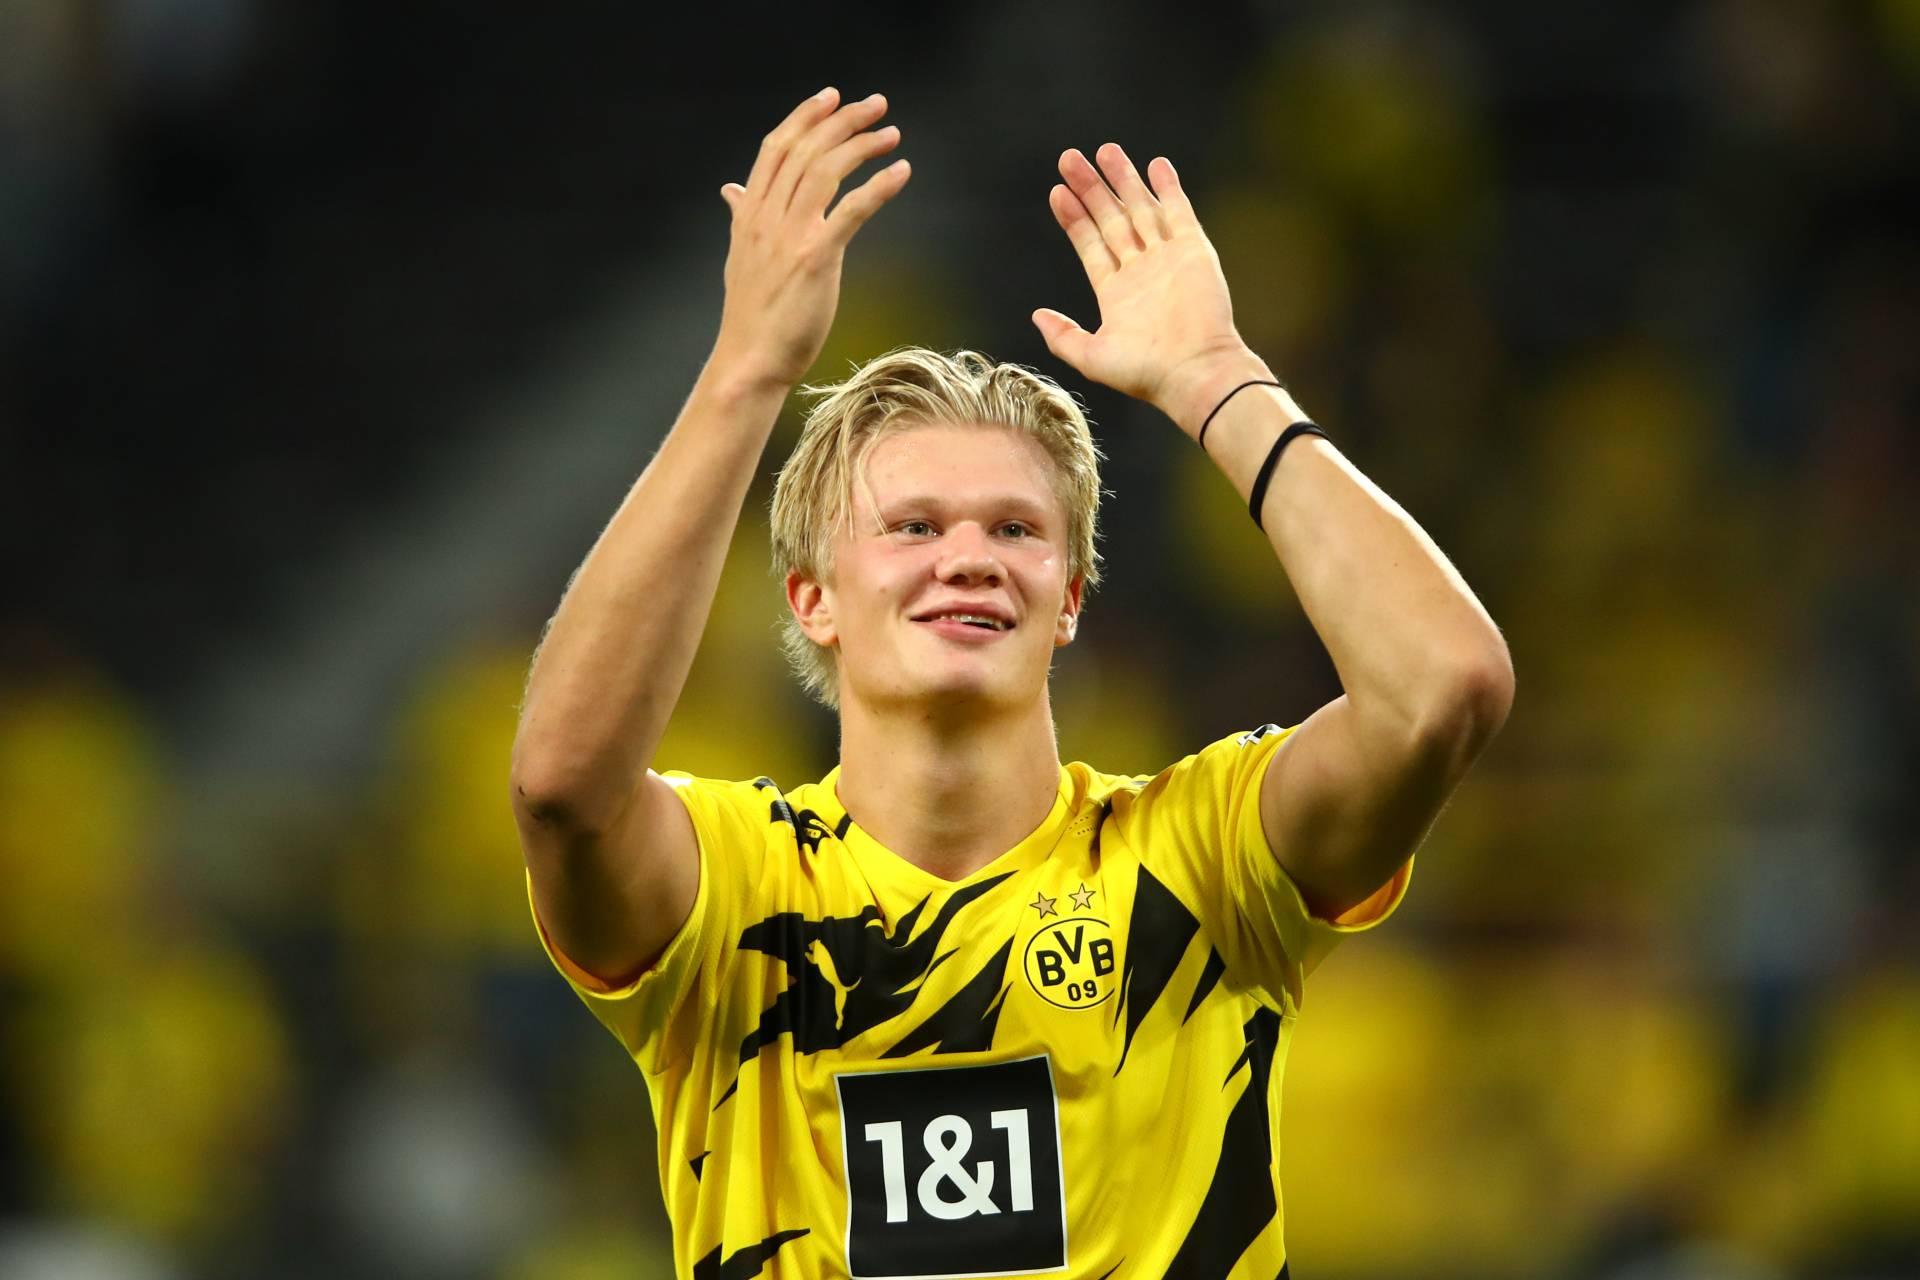 Erling Brut Haaland in maglia Borussia Dortmund